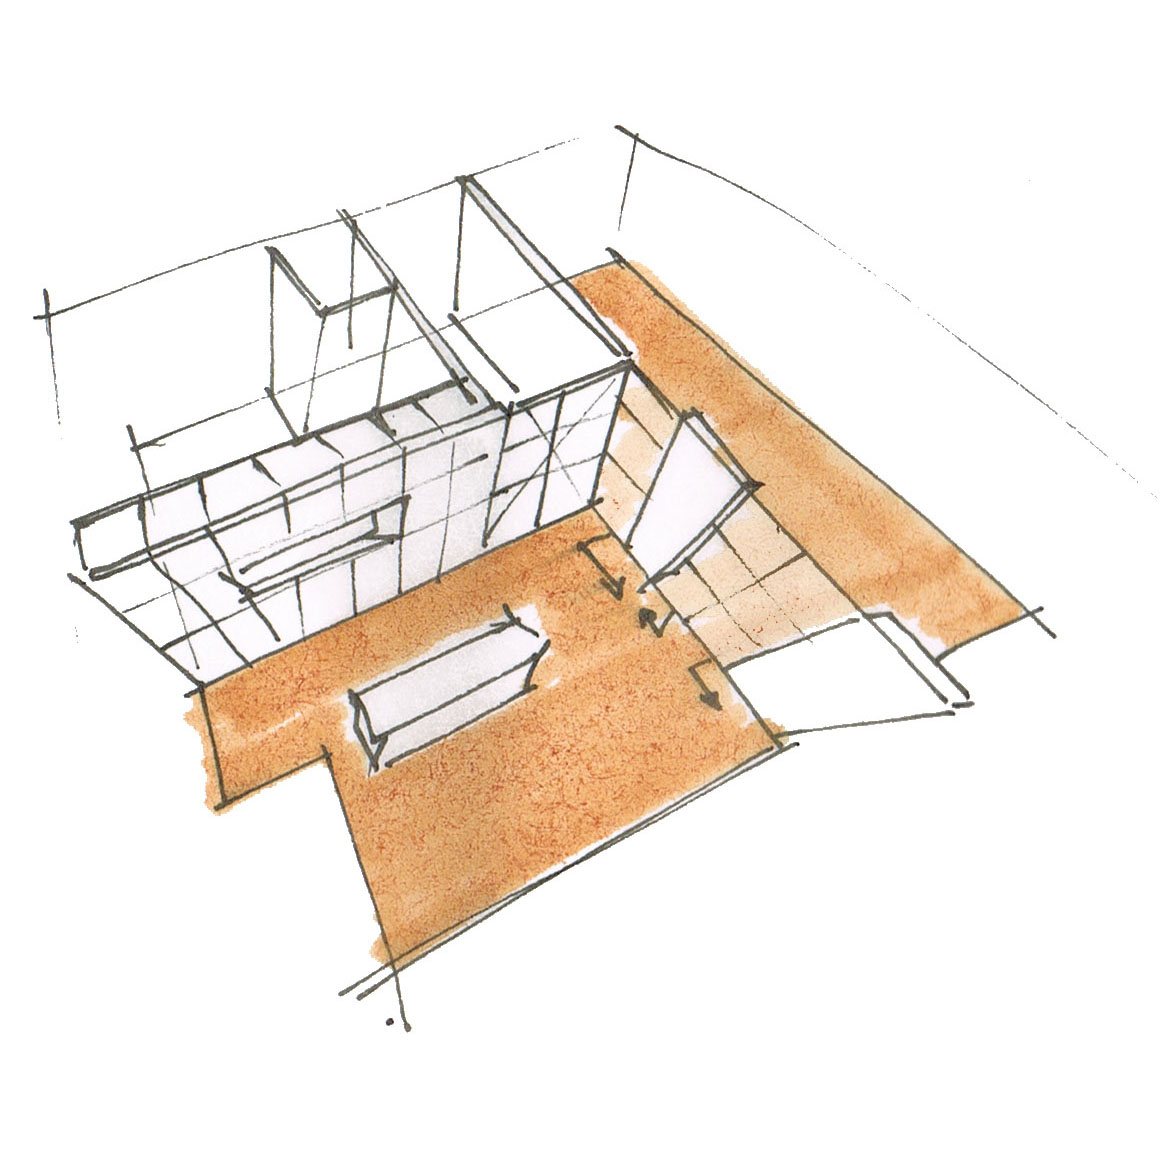 stoel_architect_kampen_stoelaantafel (10)